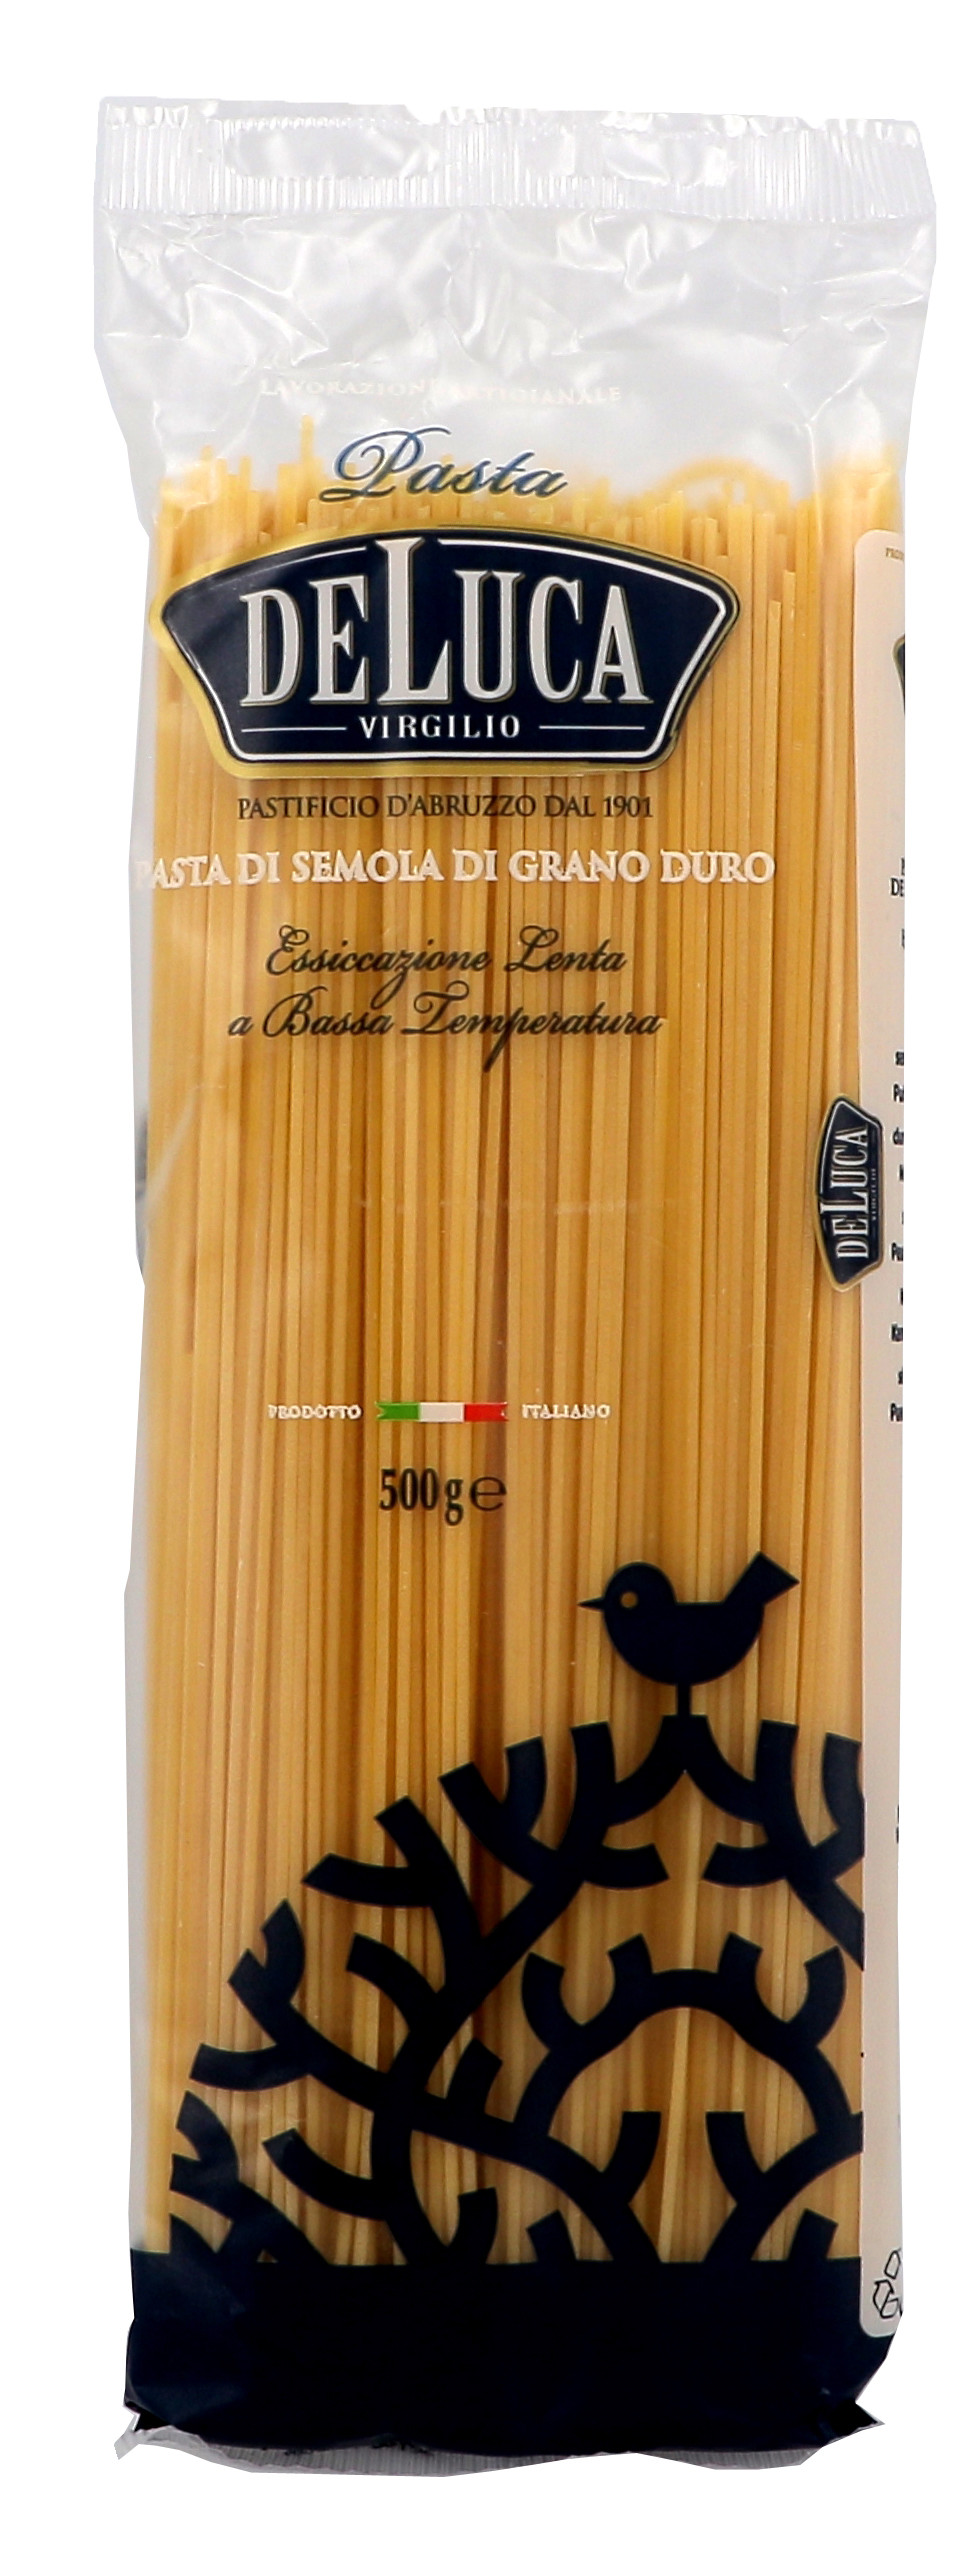 Pasta De Luca Fidelini Nº2 spaghetti 500gr zakjes pasta